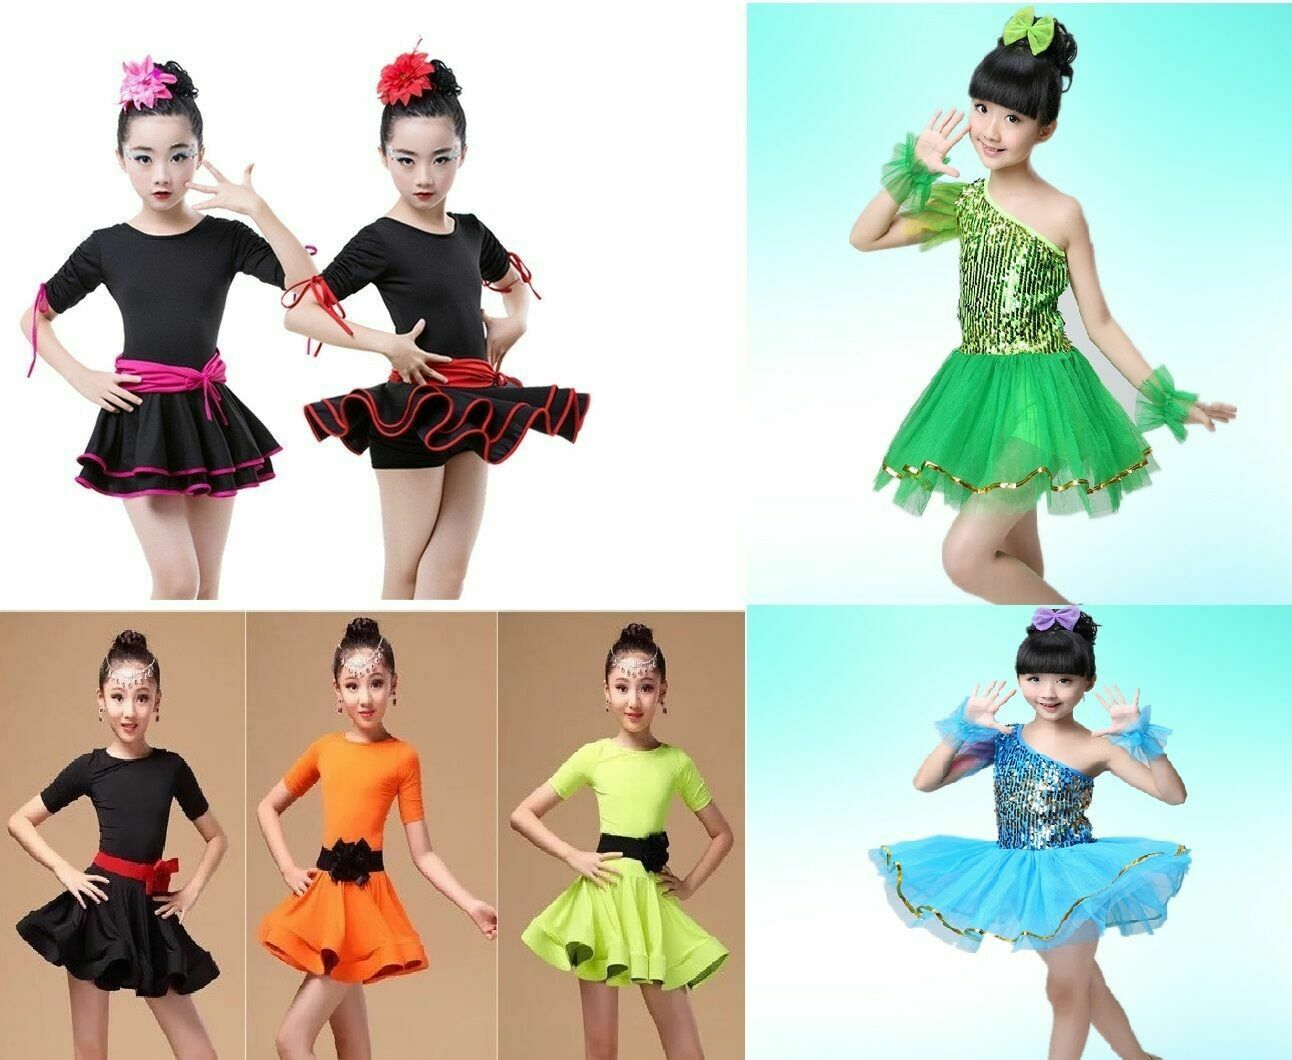 Dance Costumes Ballet Dresses Skirts Dancewear Children Girls Kids 3 - 15 years